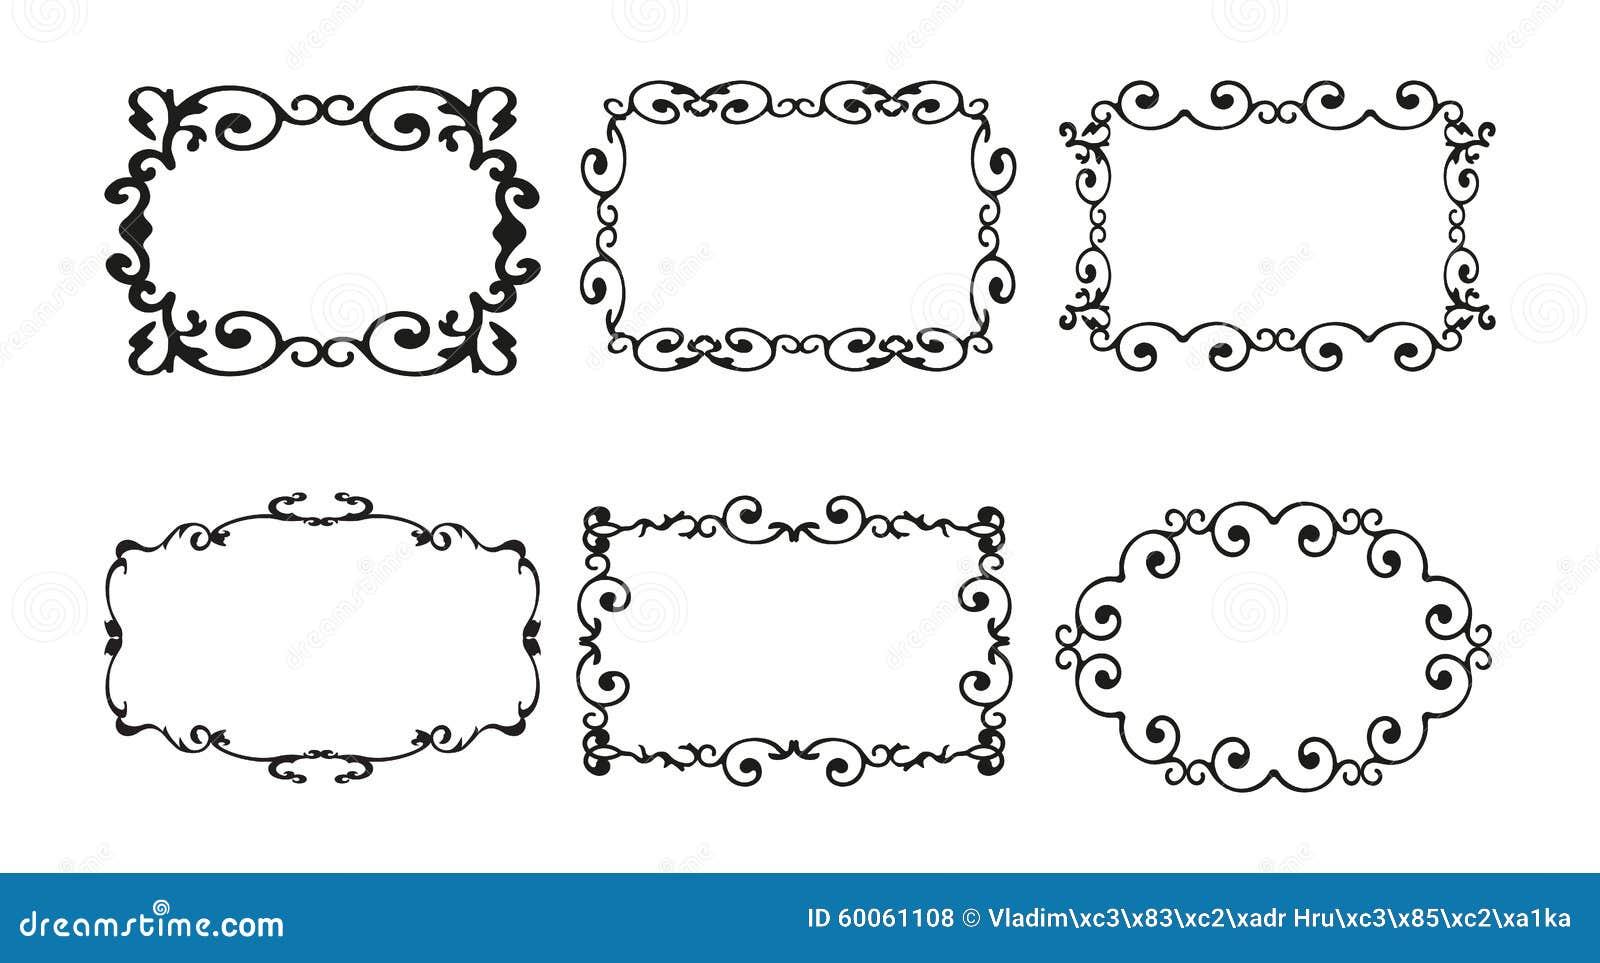 Decorative Borders For Word Vintage Border Frame Decorative Ornate Calligraphy Vector Stock